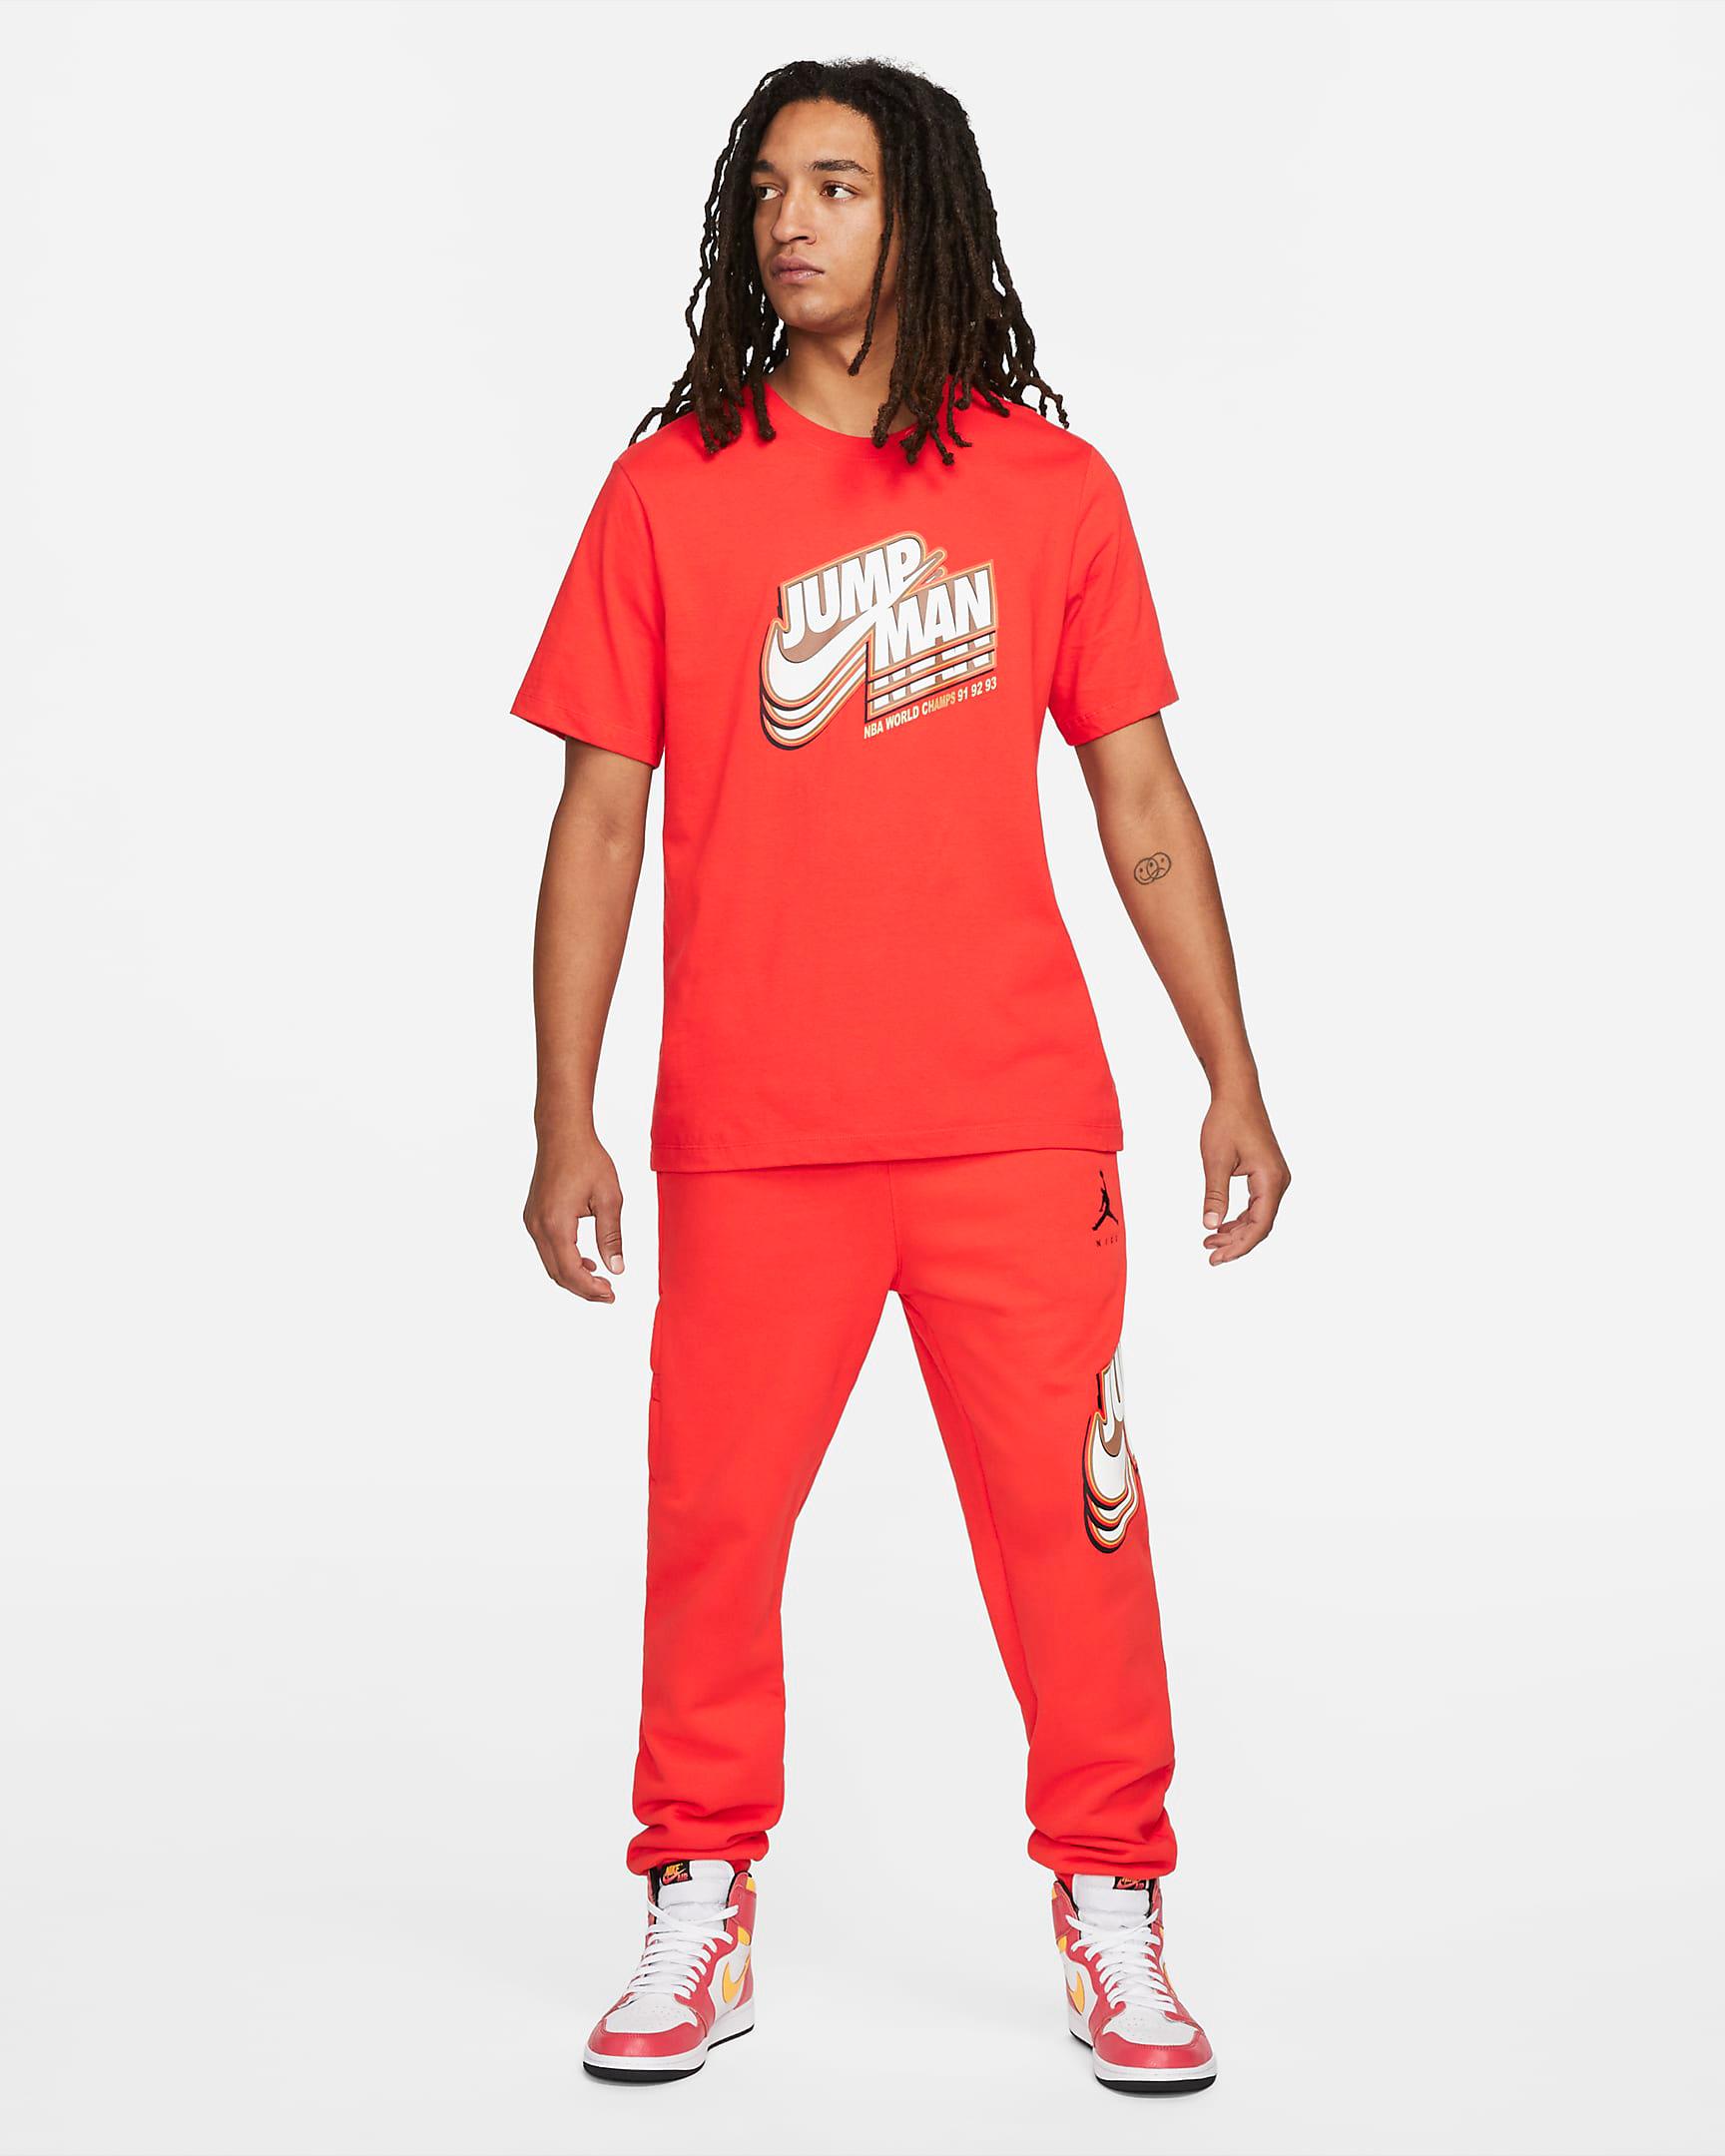 jordan-chile-red-jumpman-shirt-pants-outfit